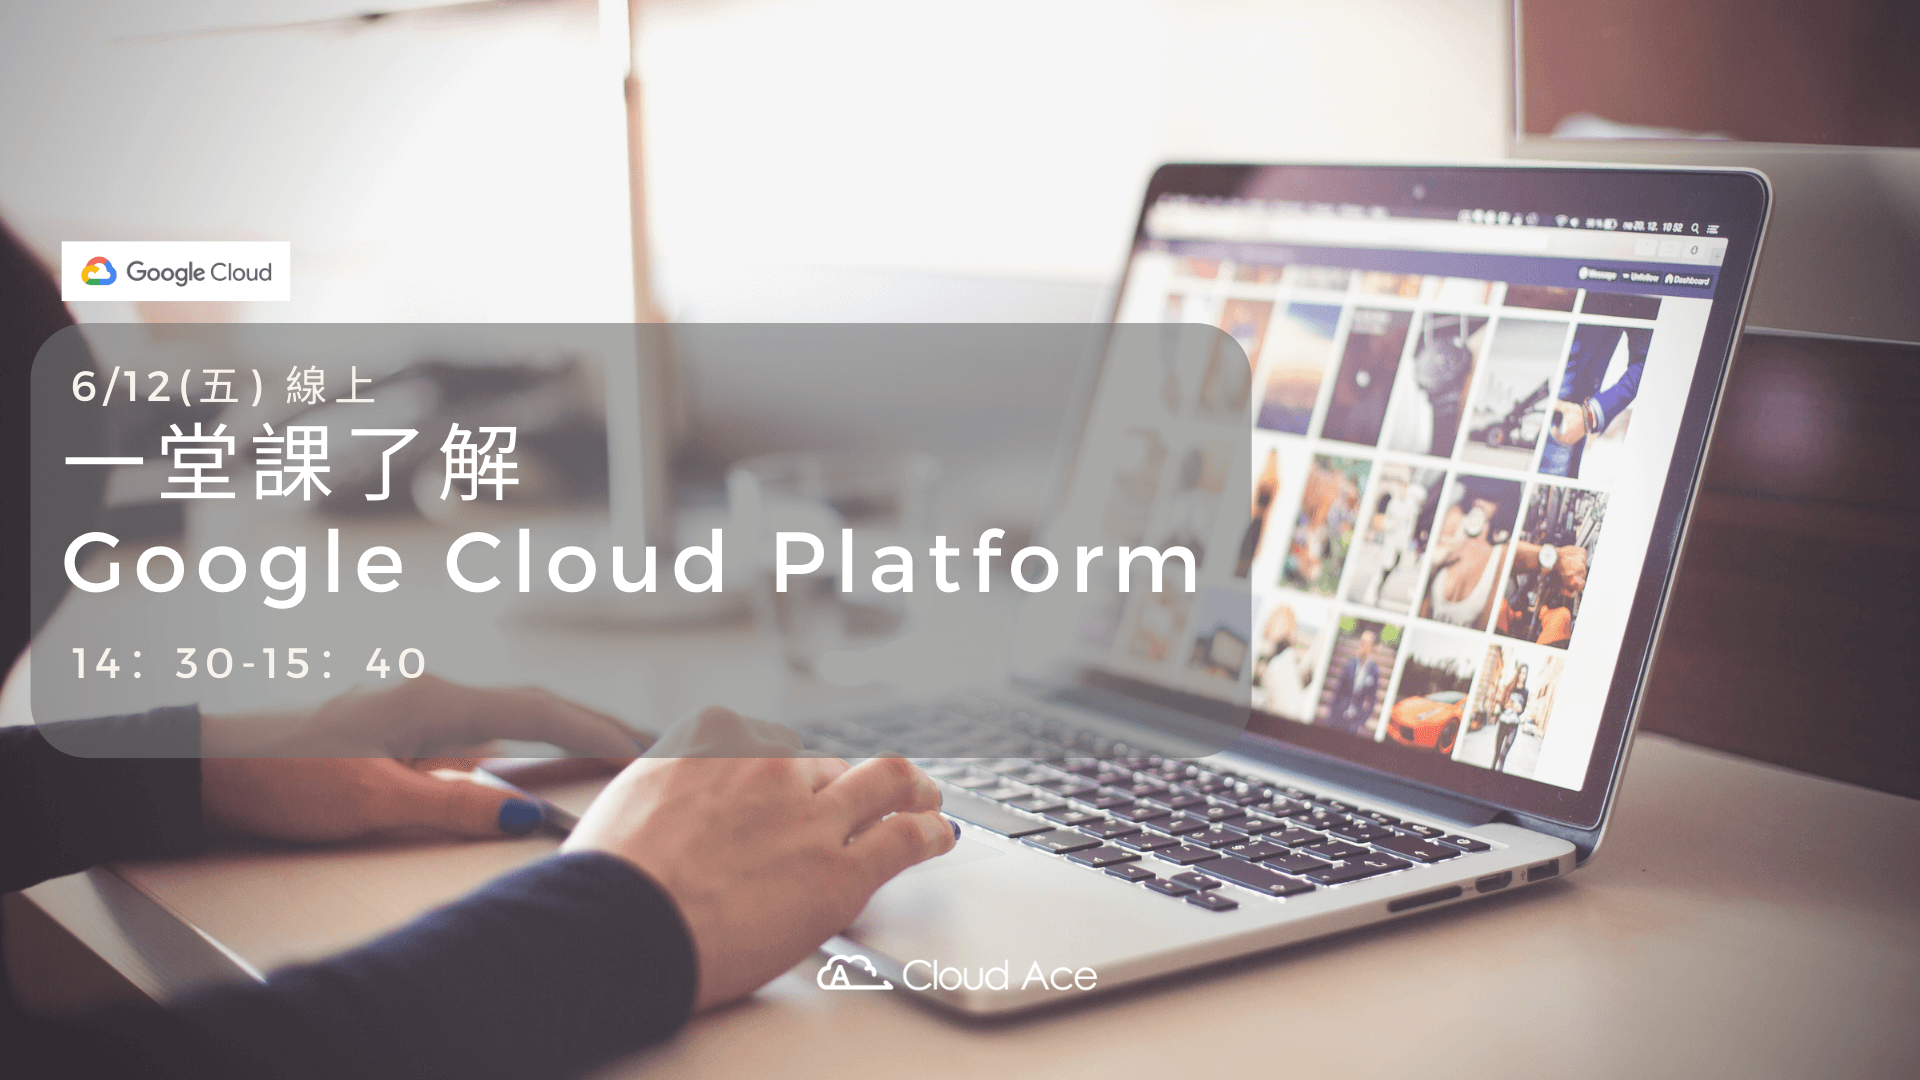 一堂課了解Google Cloud Platform